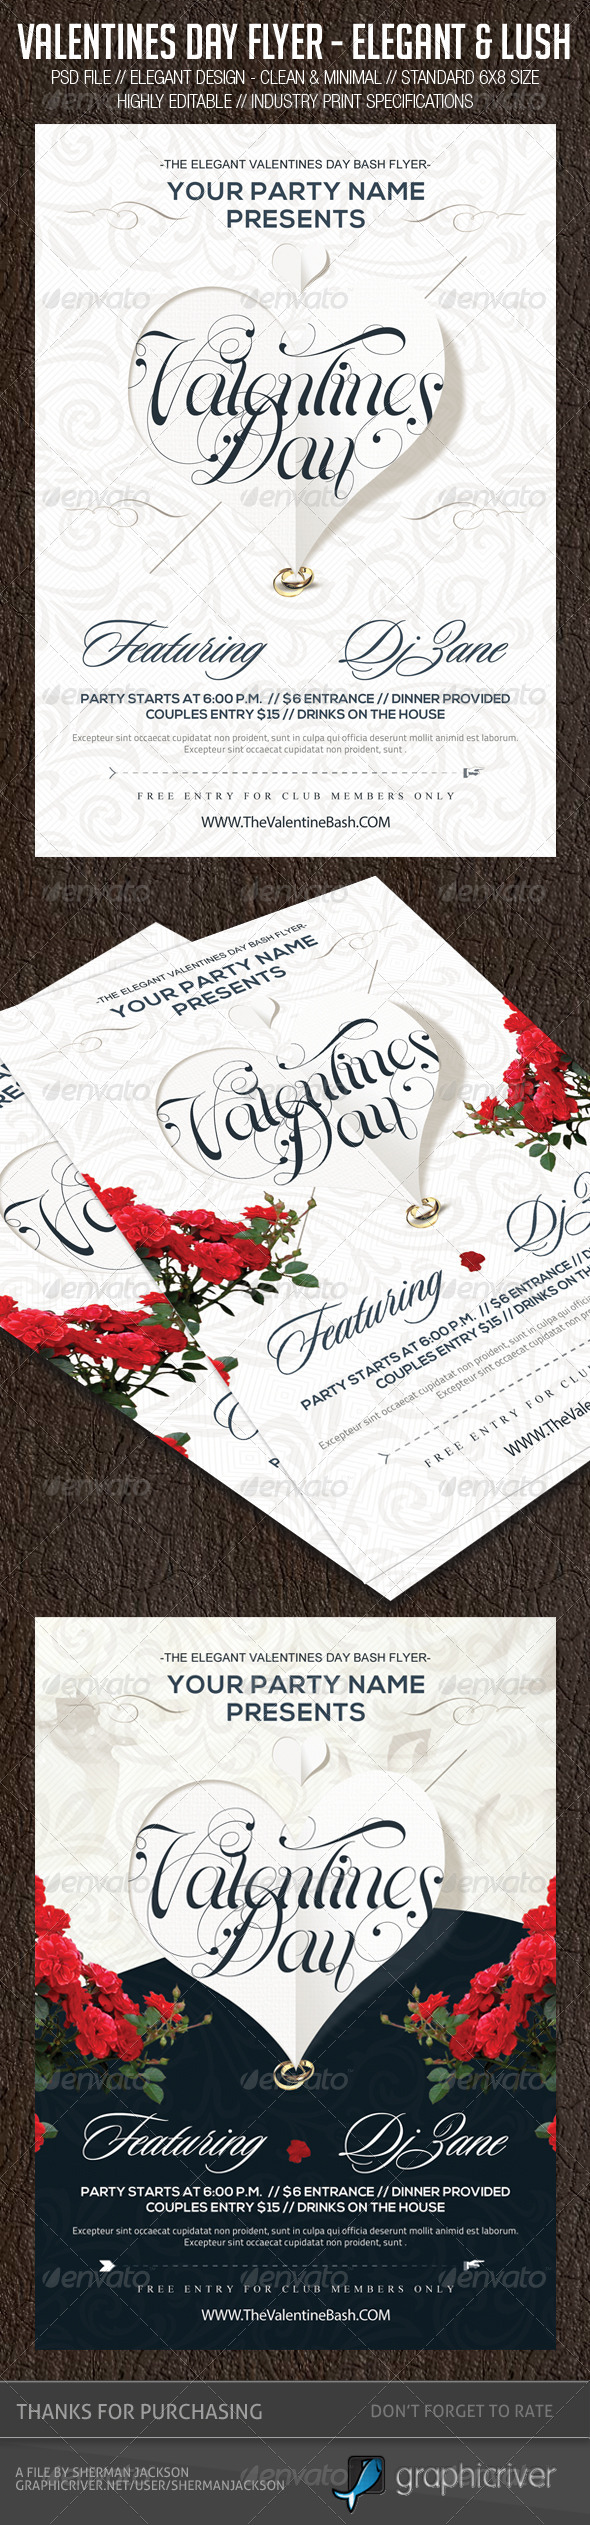 Valentines Day Flyer - Elegant & Lush - Events Flyers